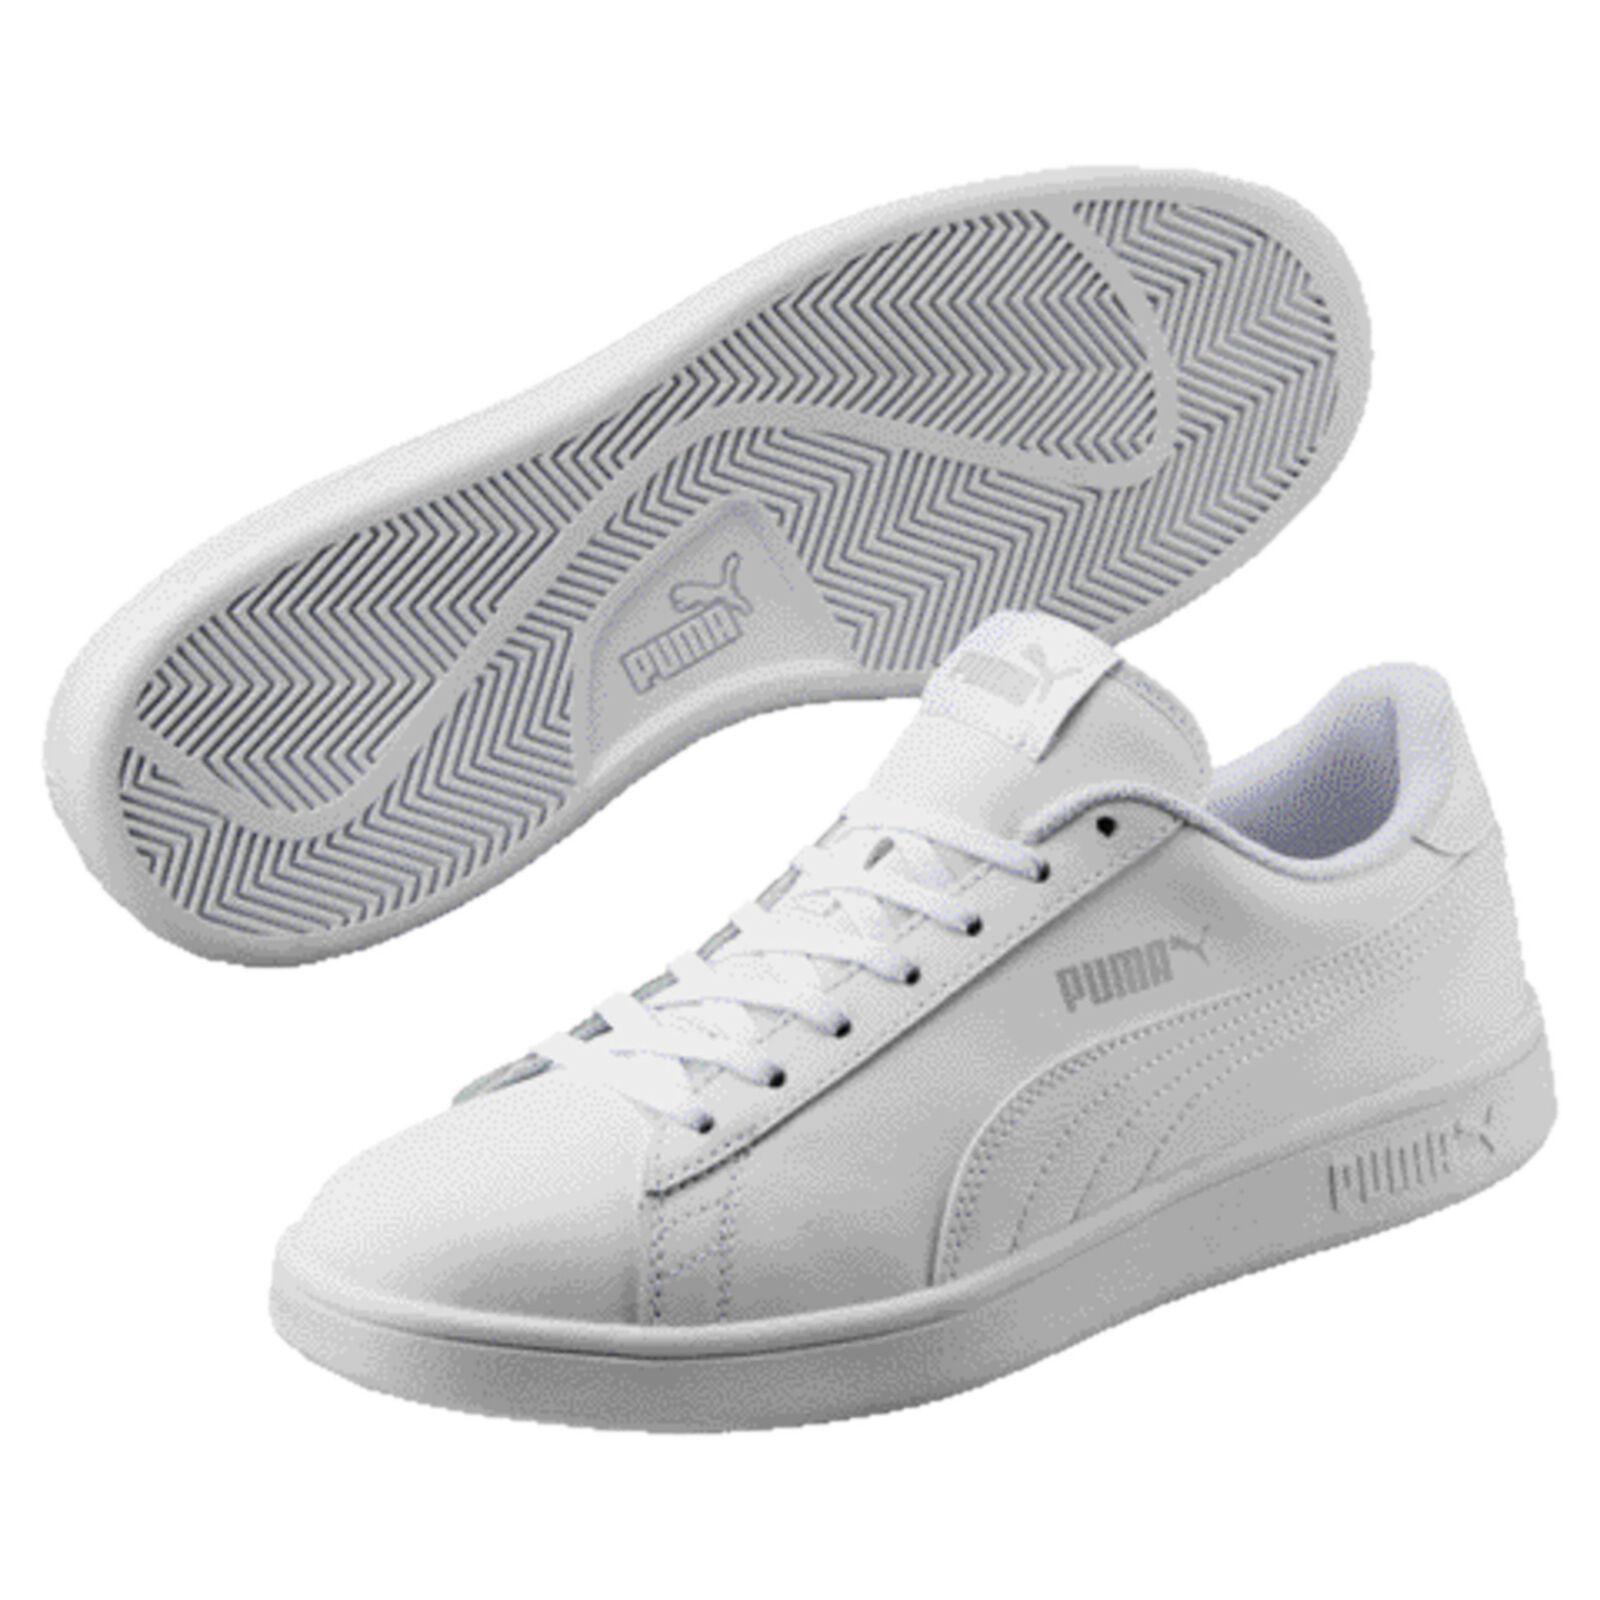 PUMA Men's Smash v2 Sneakers for sale